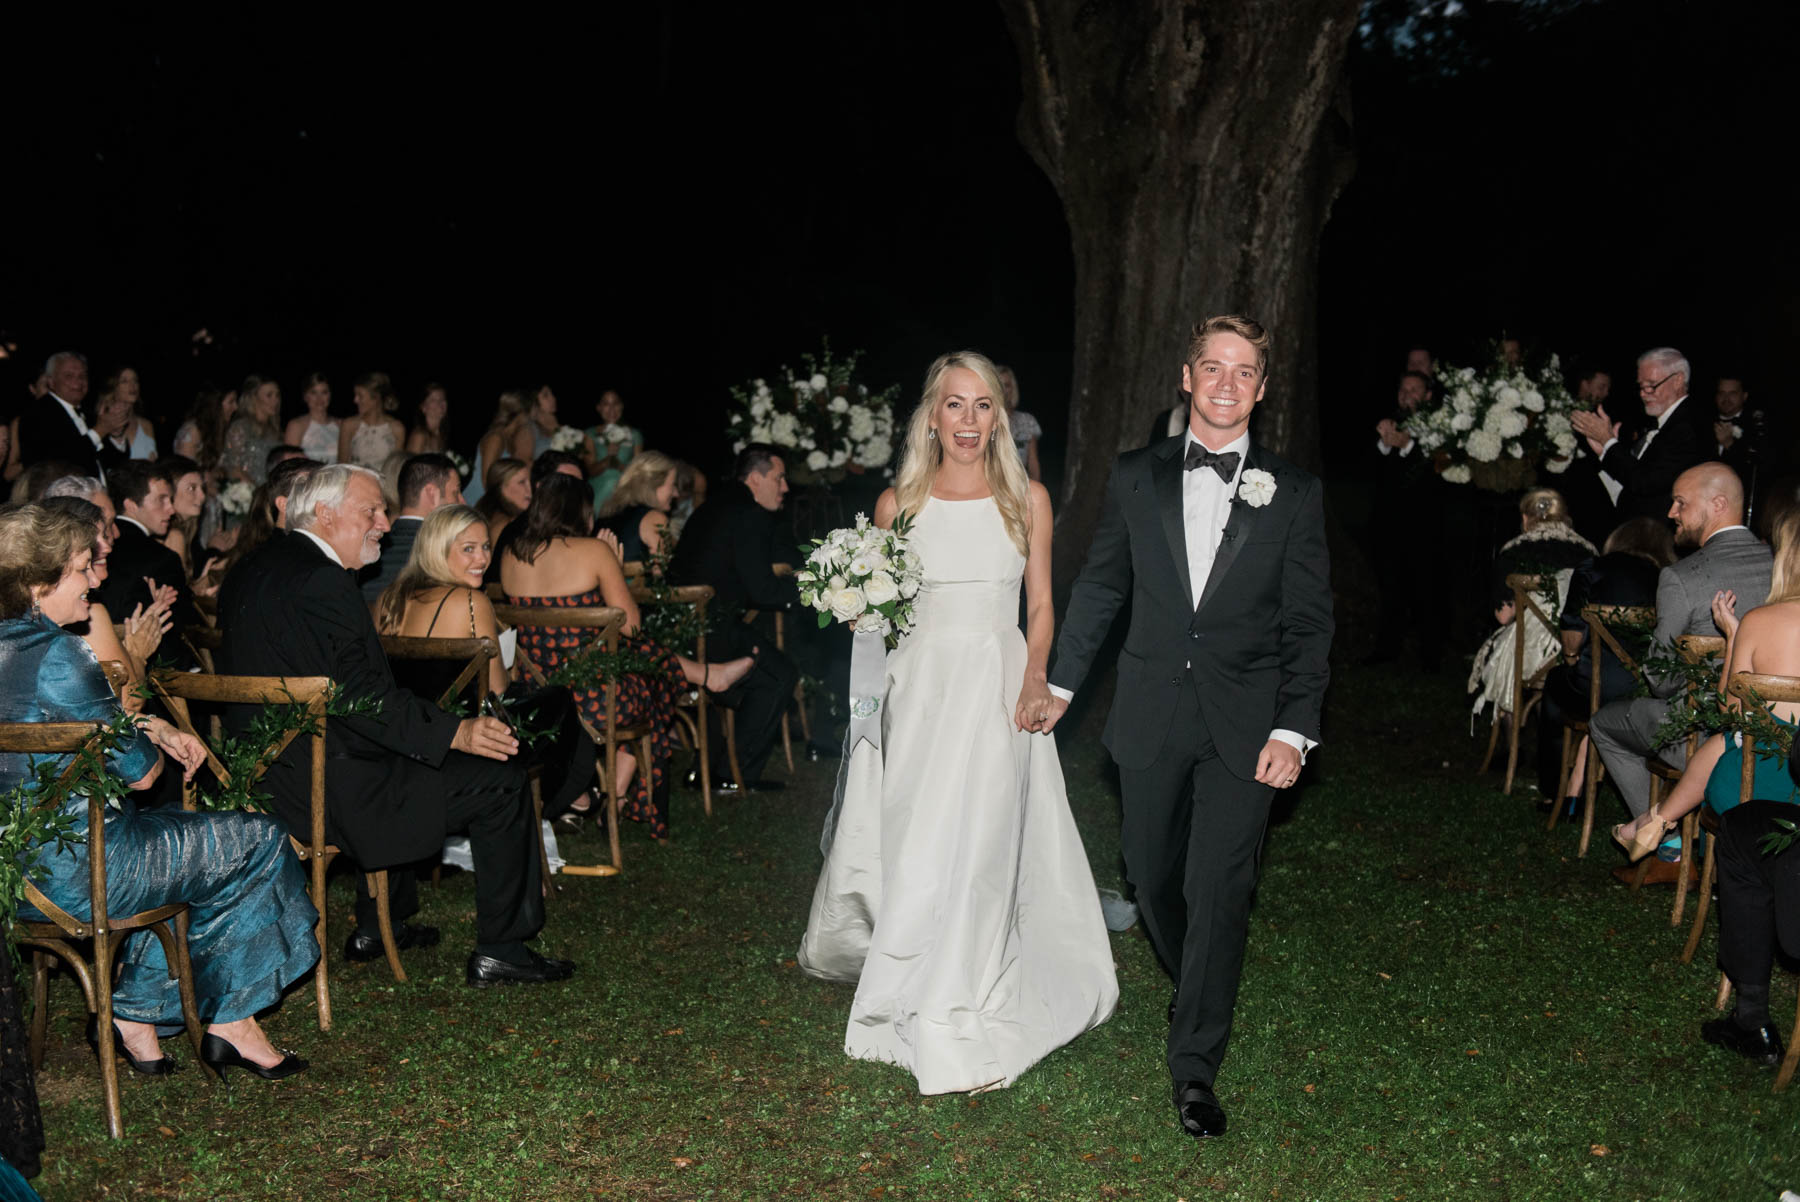 Jillian Attaway Eversole marries the love of her life in Charleston, South Carolina // Rhyme & Reason